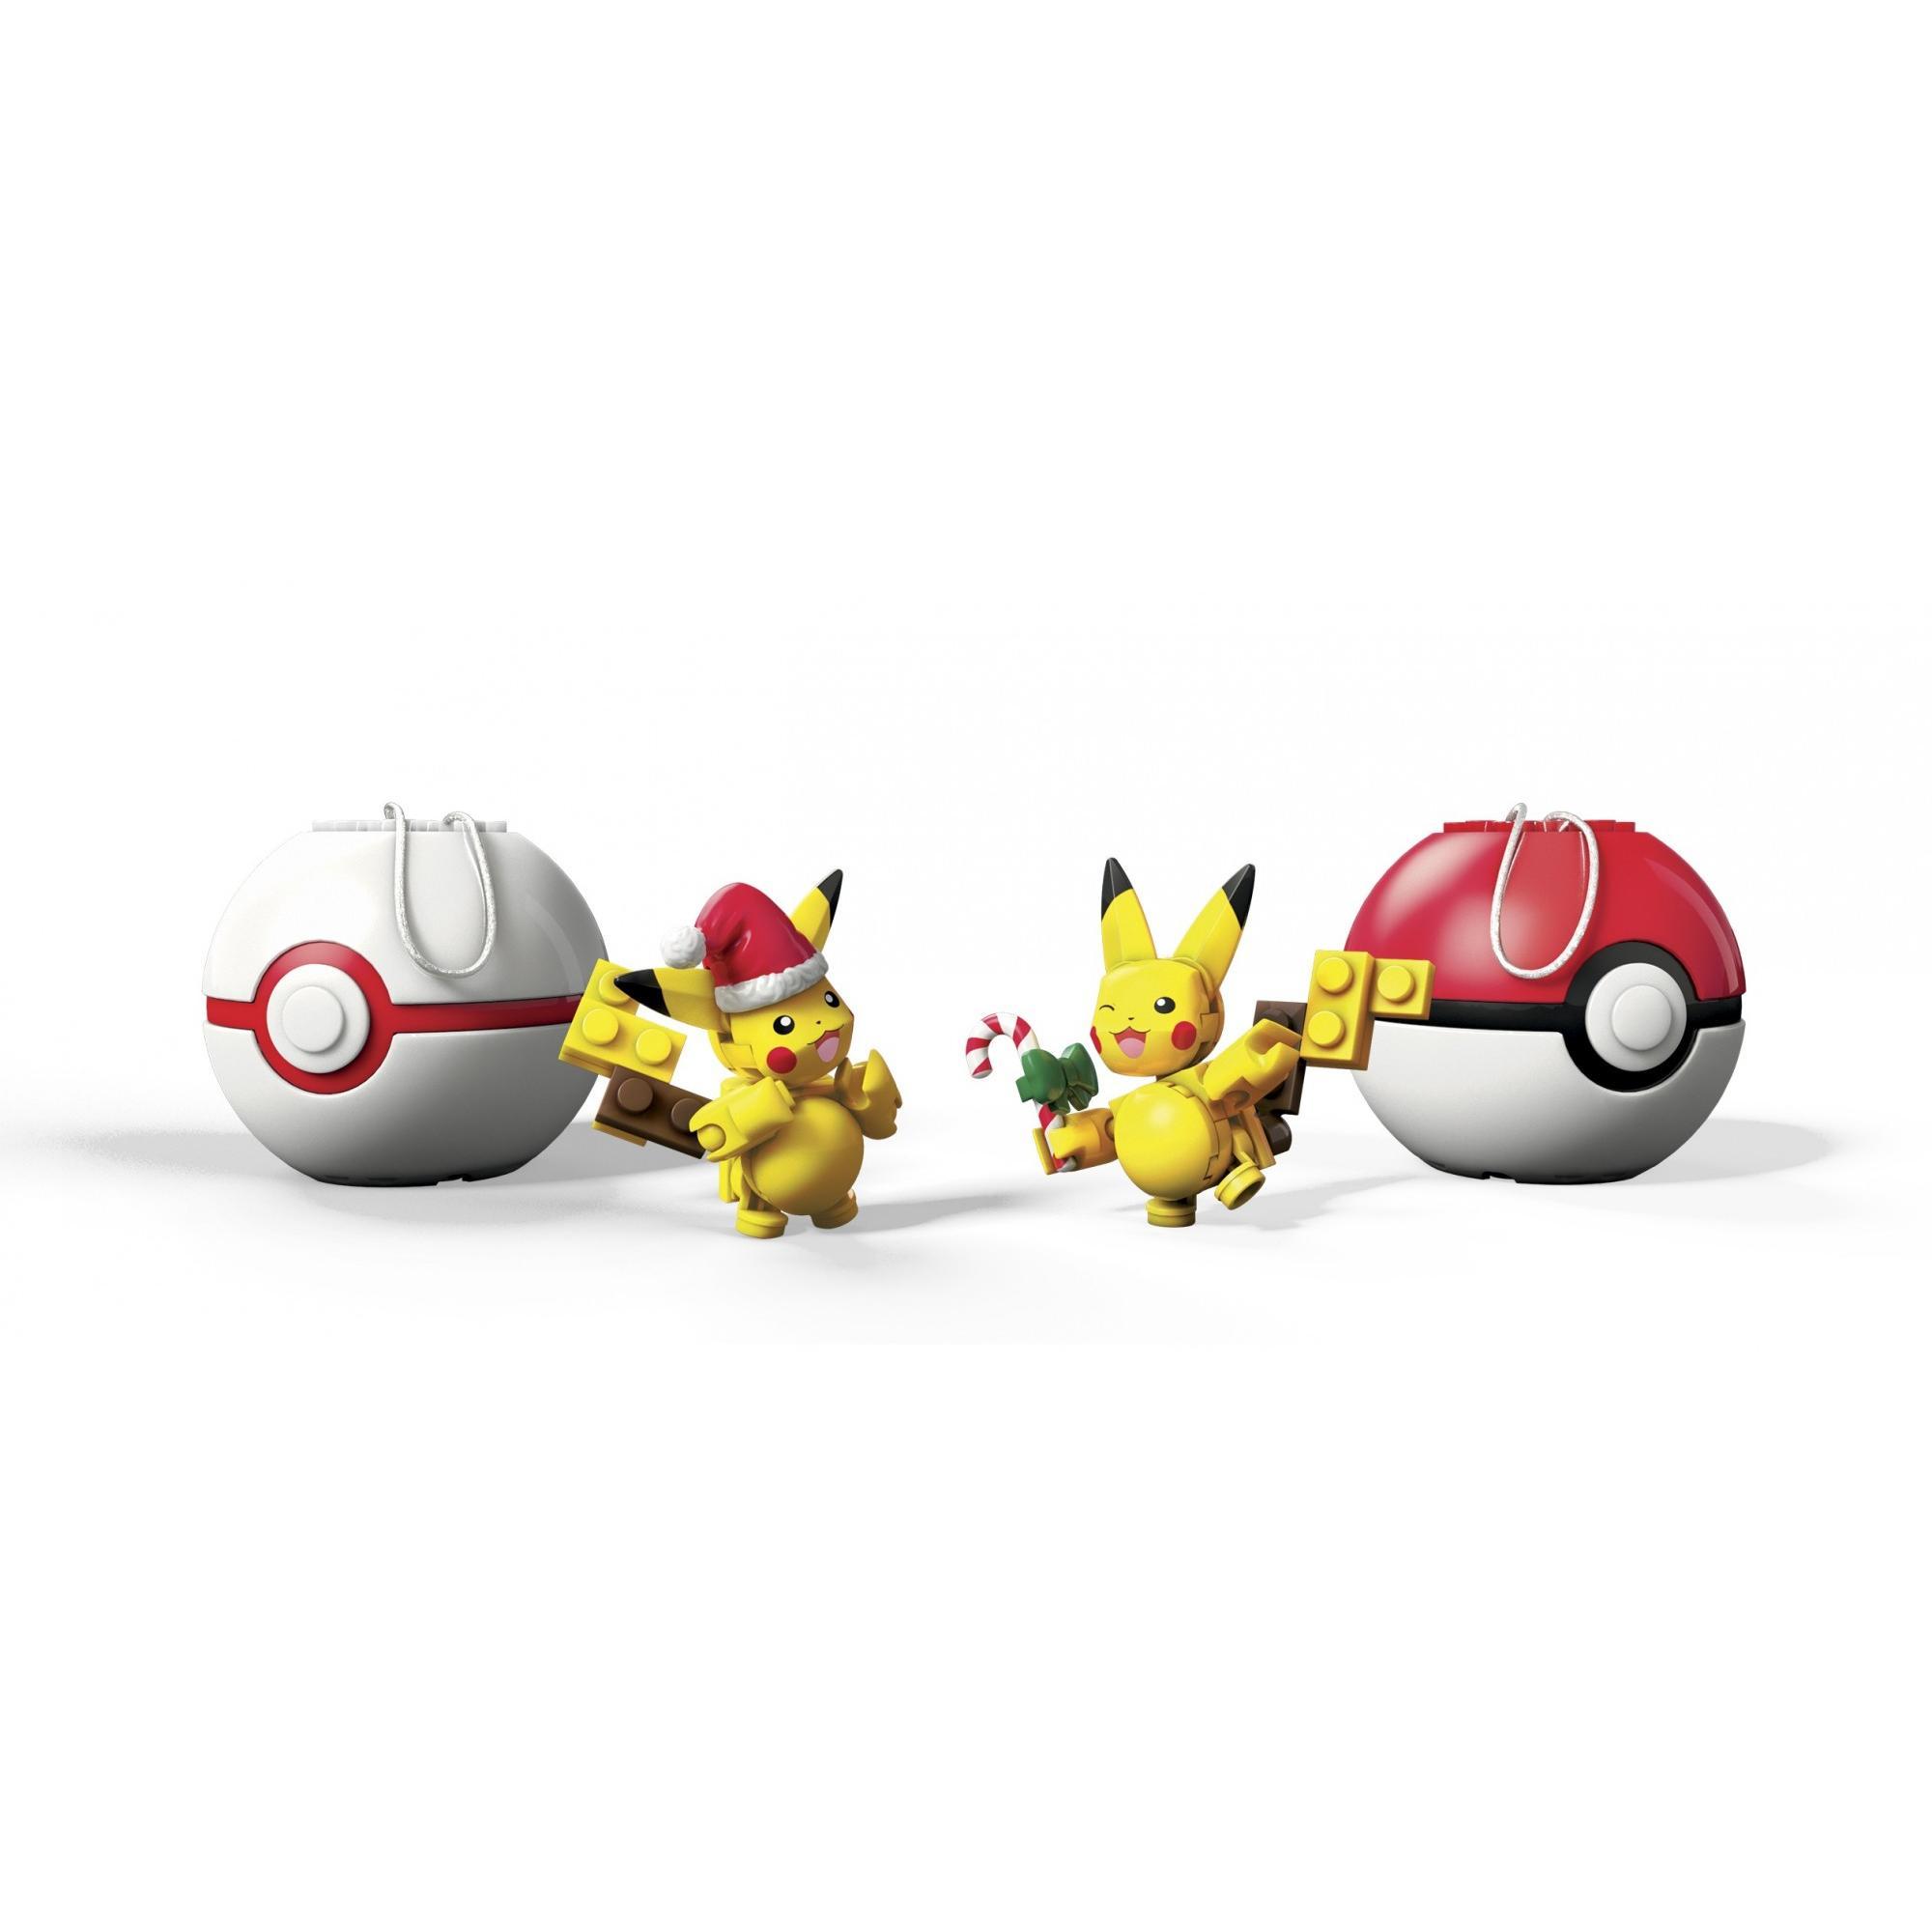 Mega Construx Pokemon Holiday Poke Balls Assortment